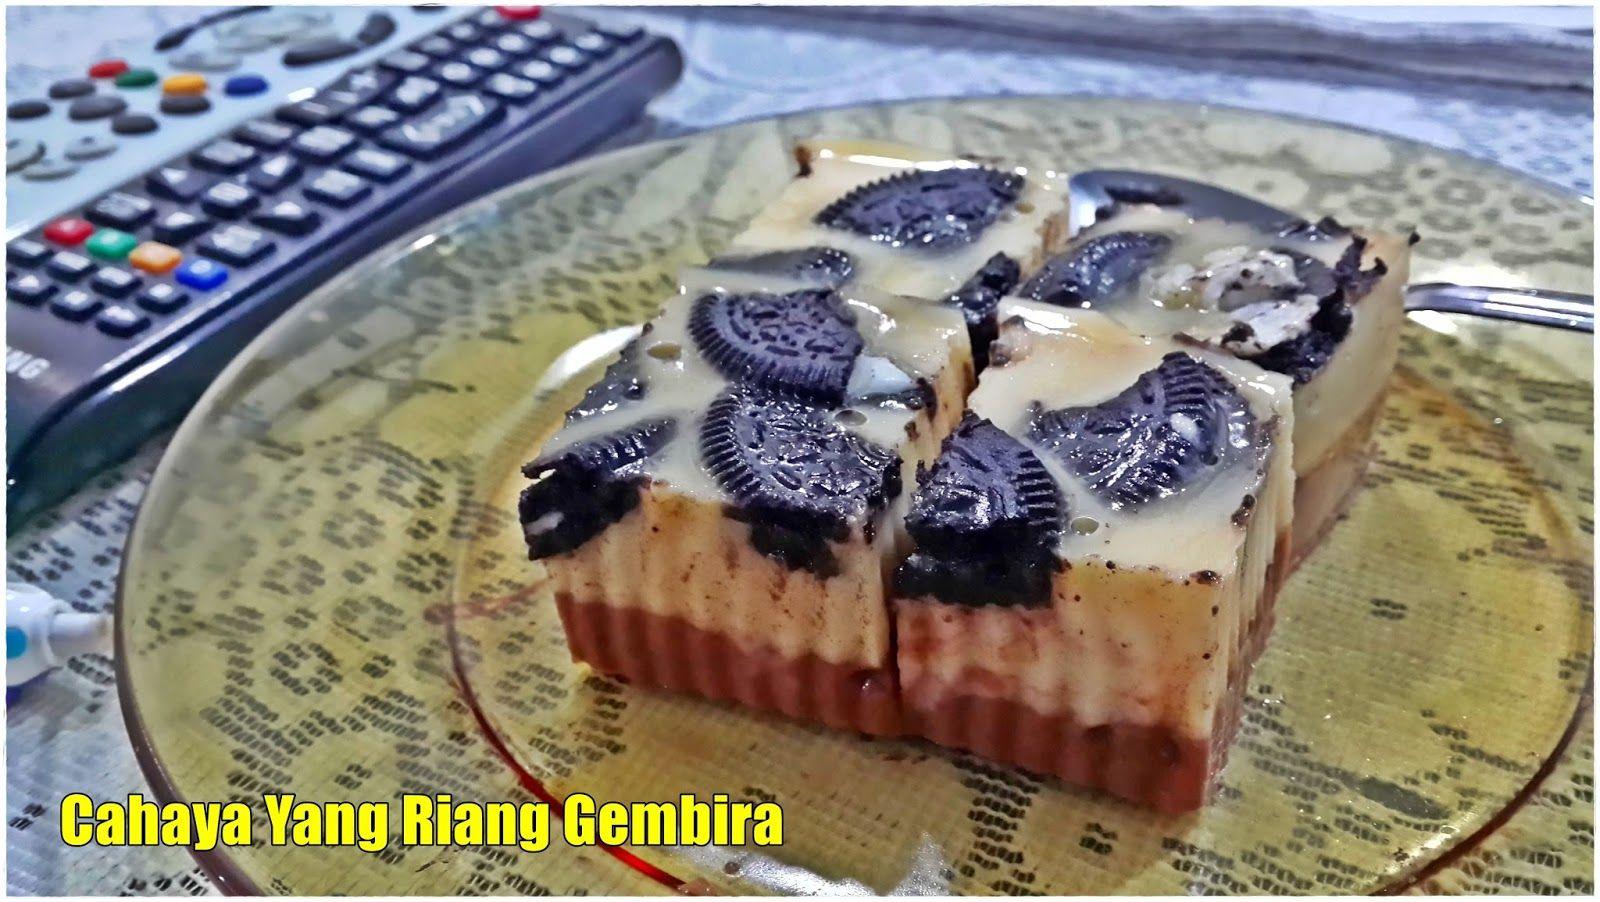 resepi puding karamel oreo recipes blog Resepi Kek Milo Cheese Enak dan Mudah